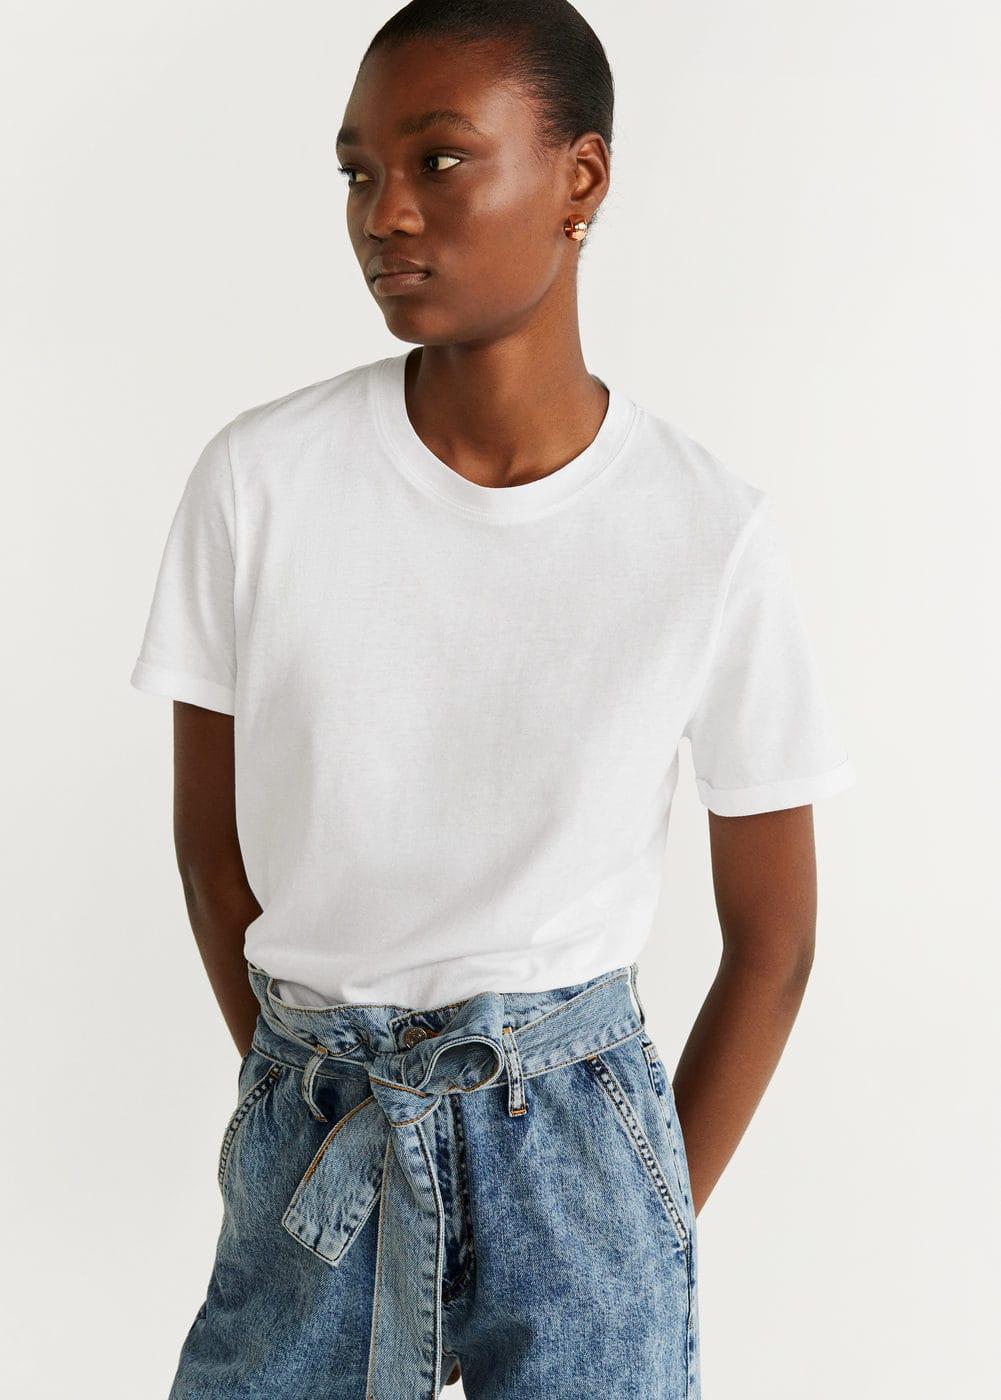 m-chalaca:camiseta algodon organico